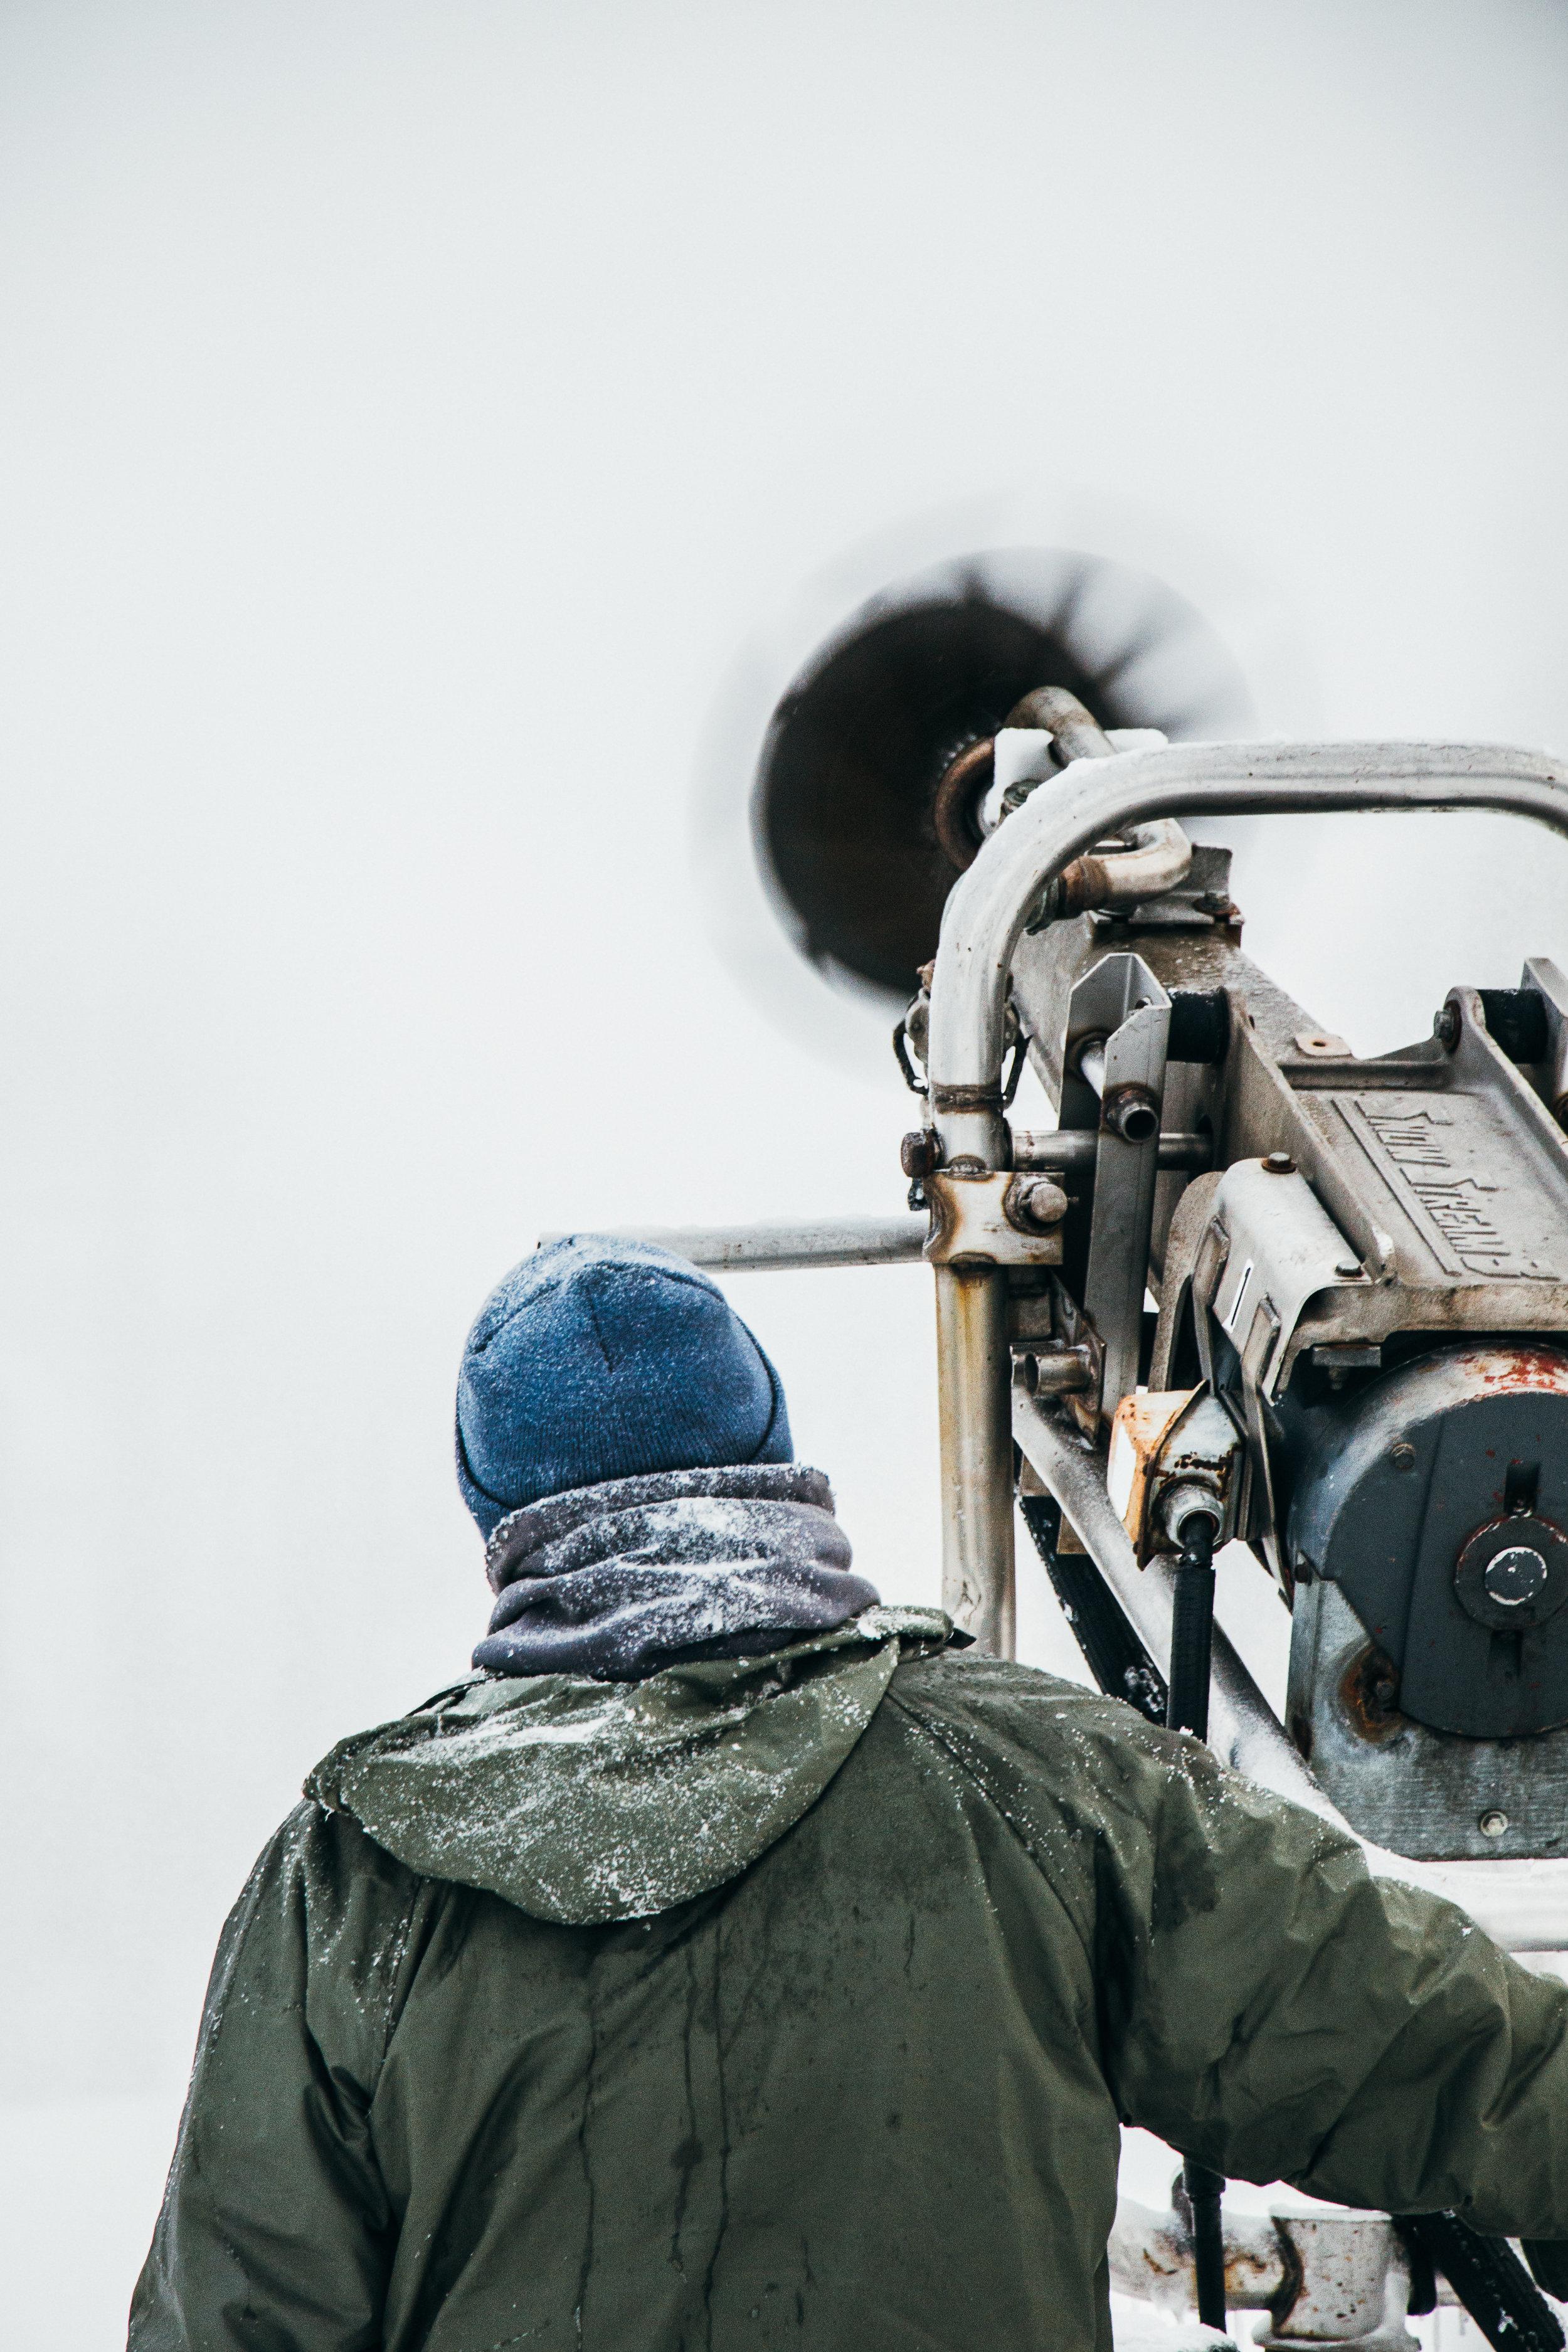 Snowmaking at Christie Mountain